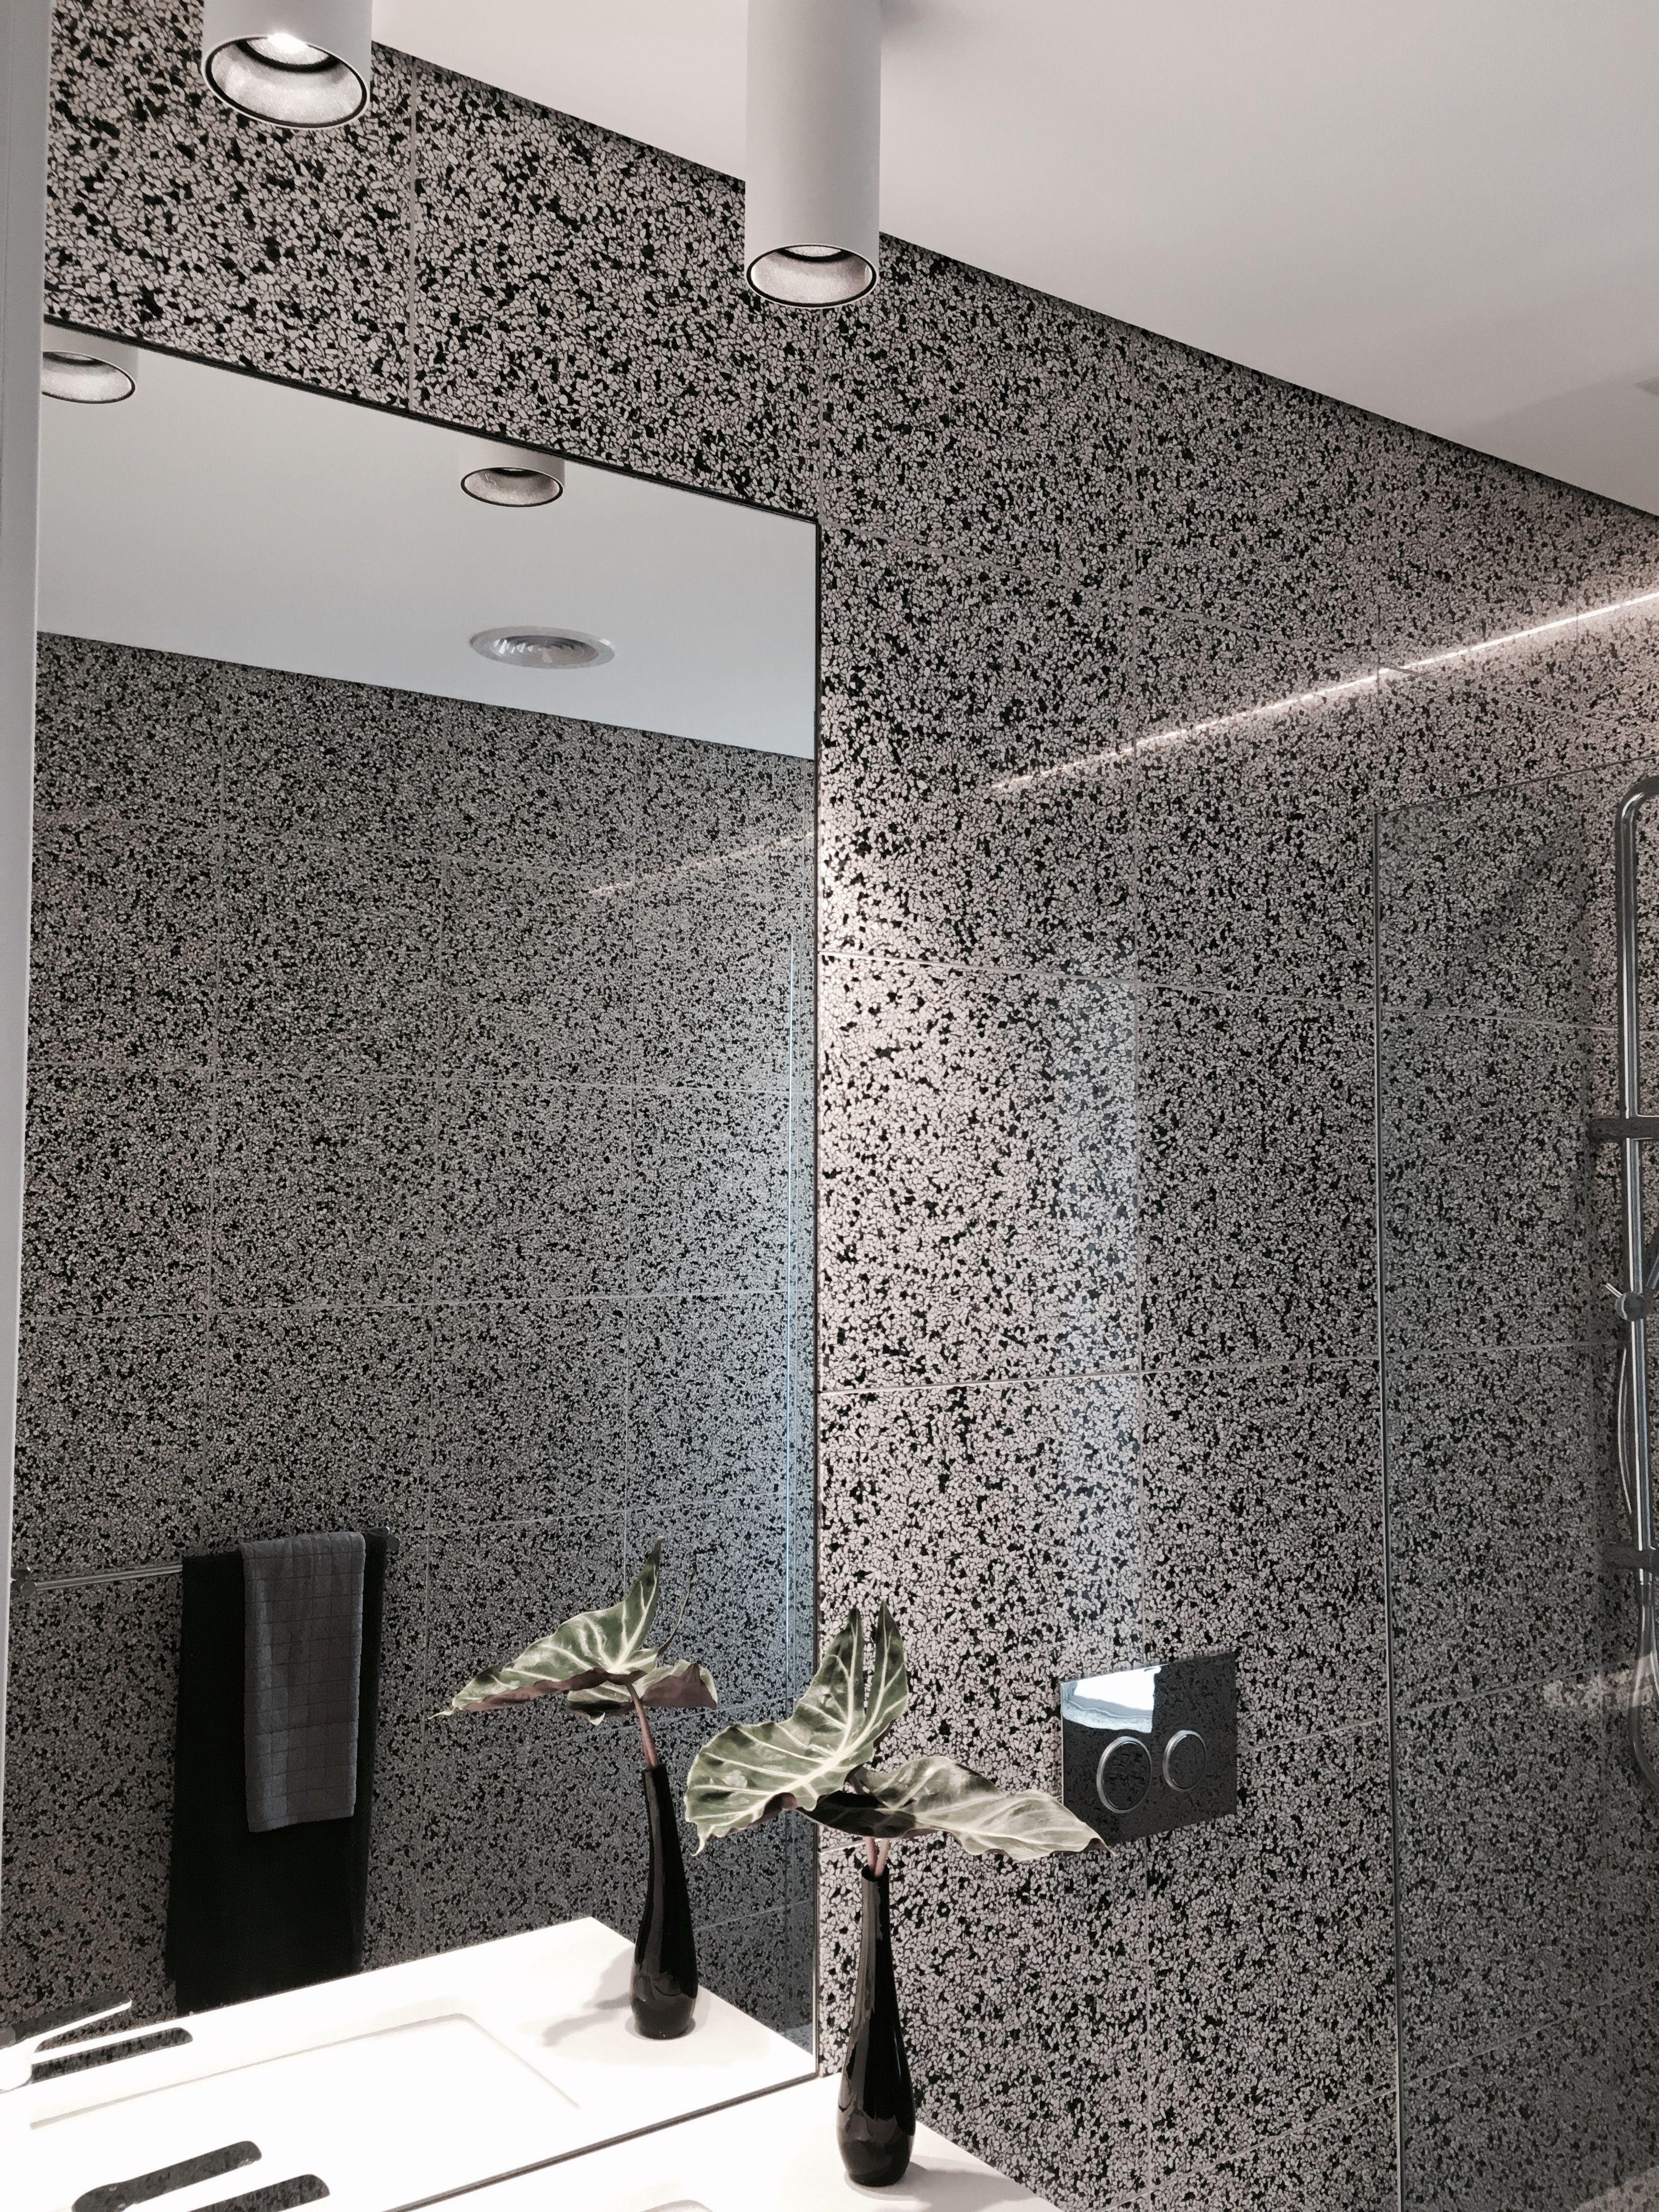 Our Terrazzo Bathroom Floor To Wall Terrazzo Terrazzo